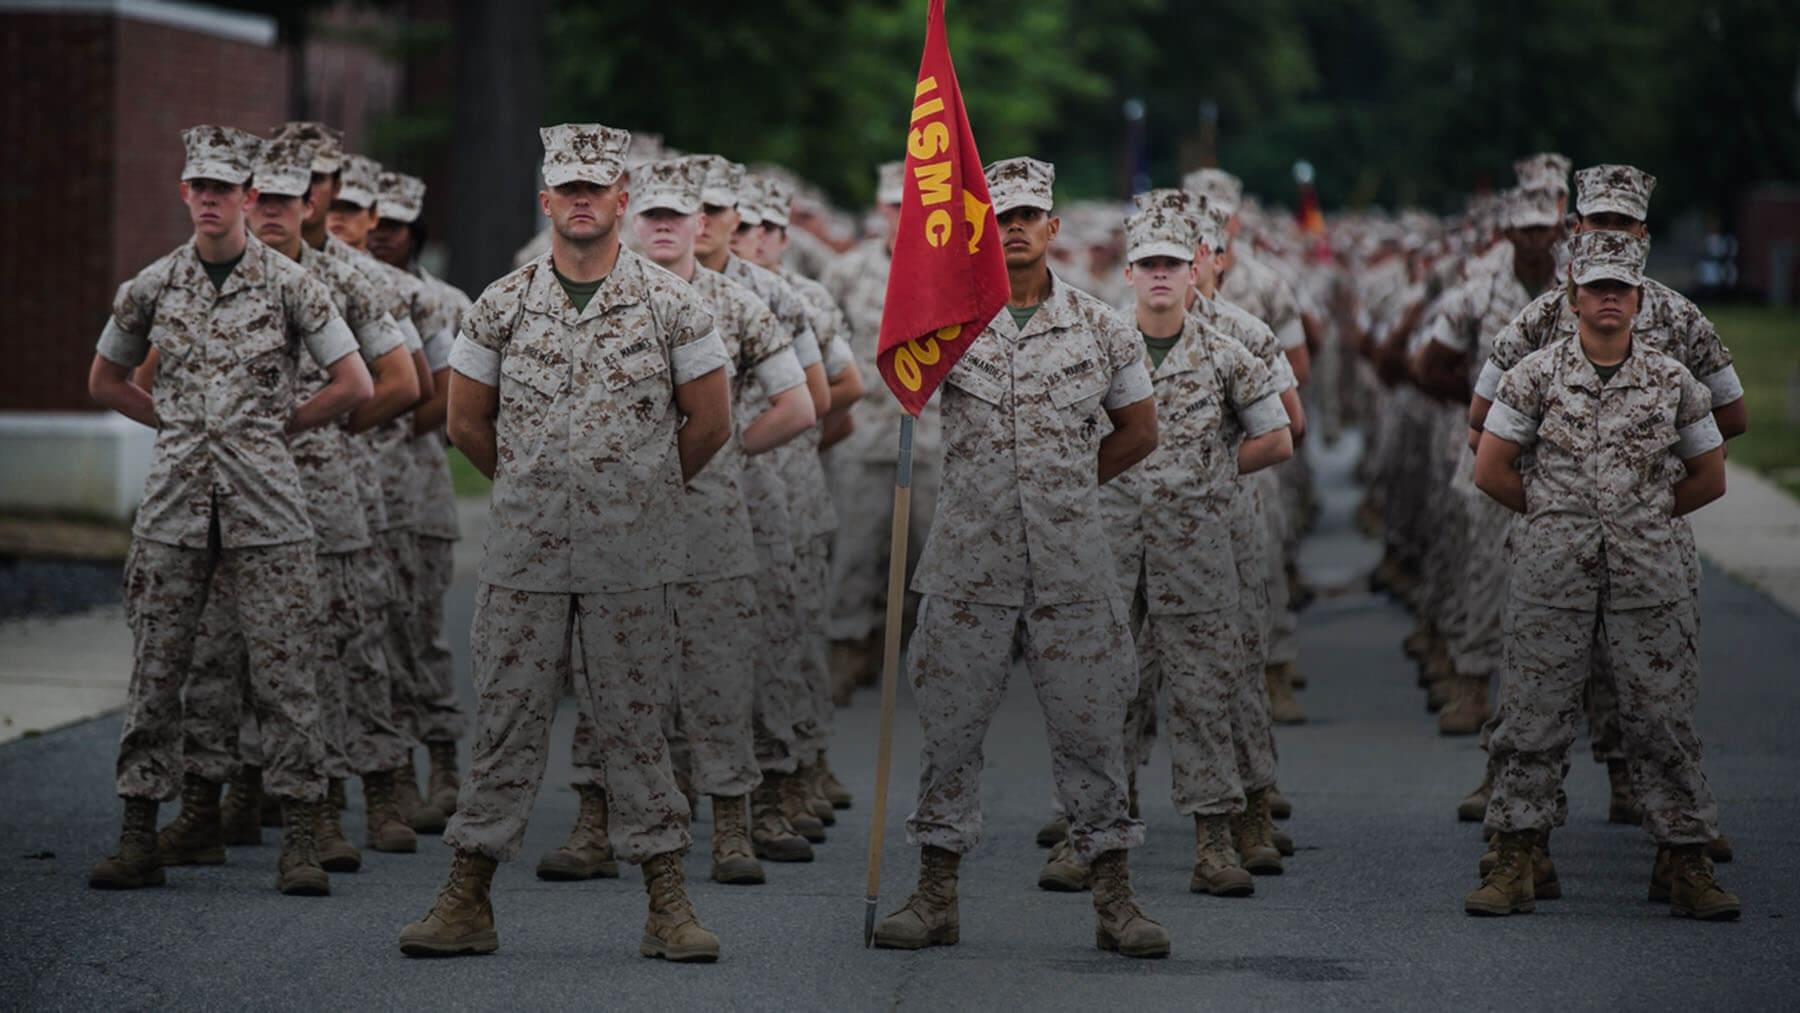 Semper Fi | Marine Corps Mottos, Values, & Principles | Marines